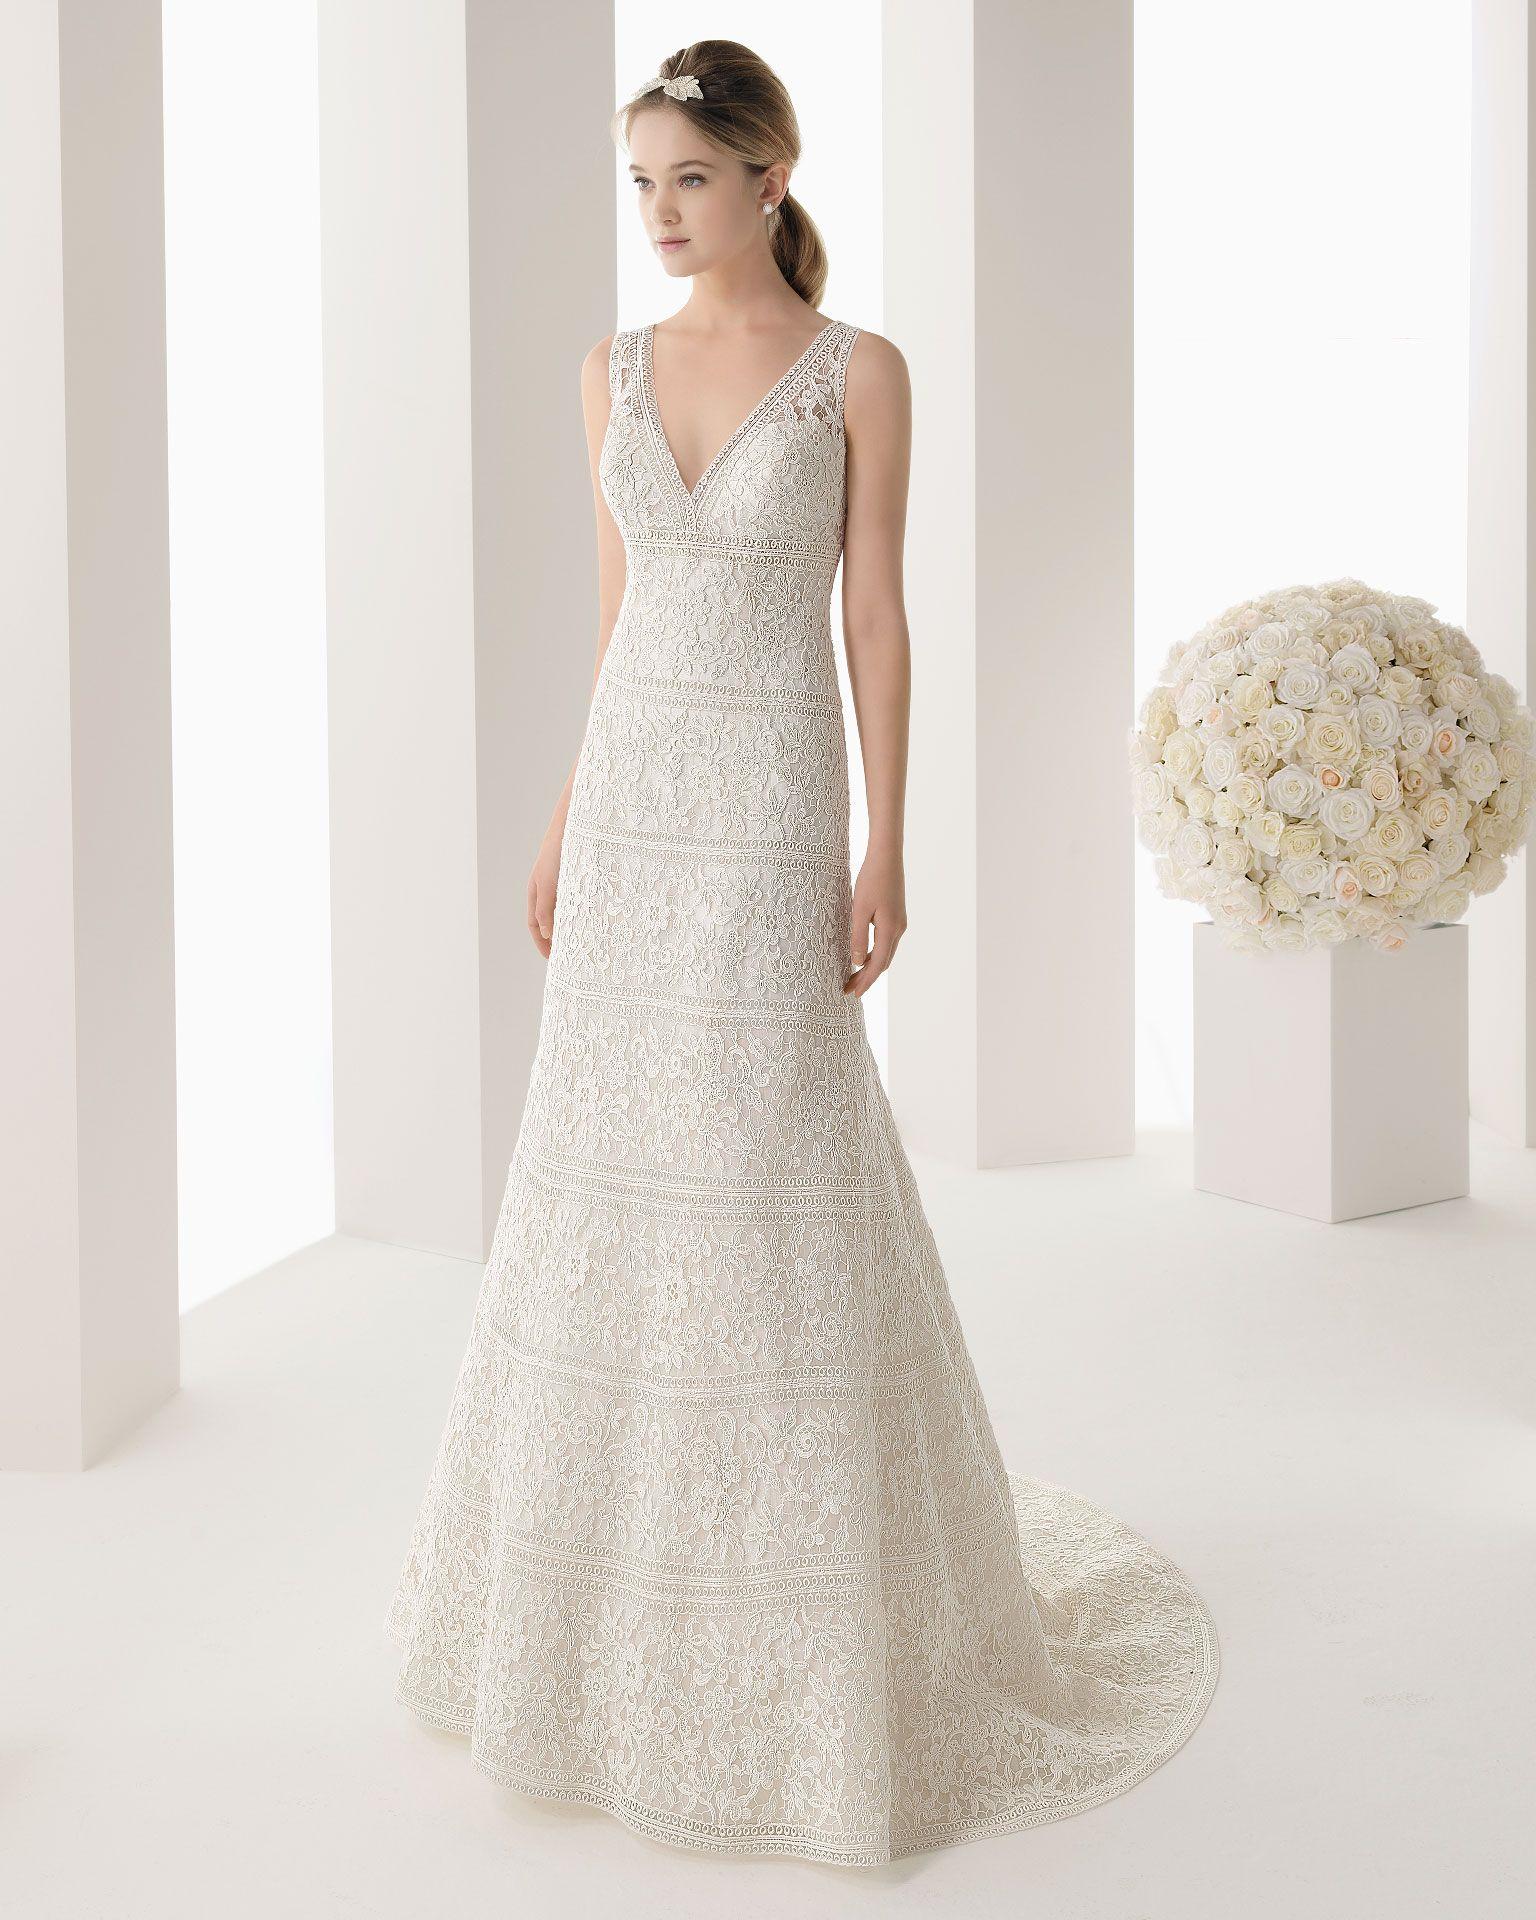 MONTANA - Guipure dress in a natural colour.S07 - Seida silver ...